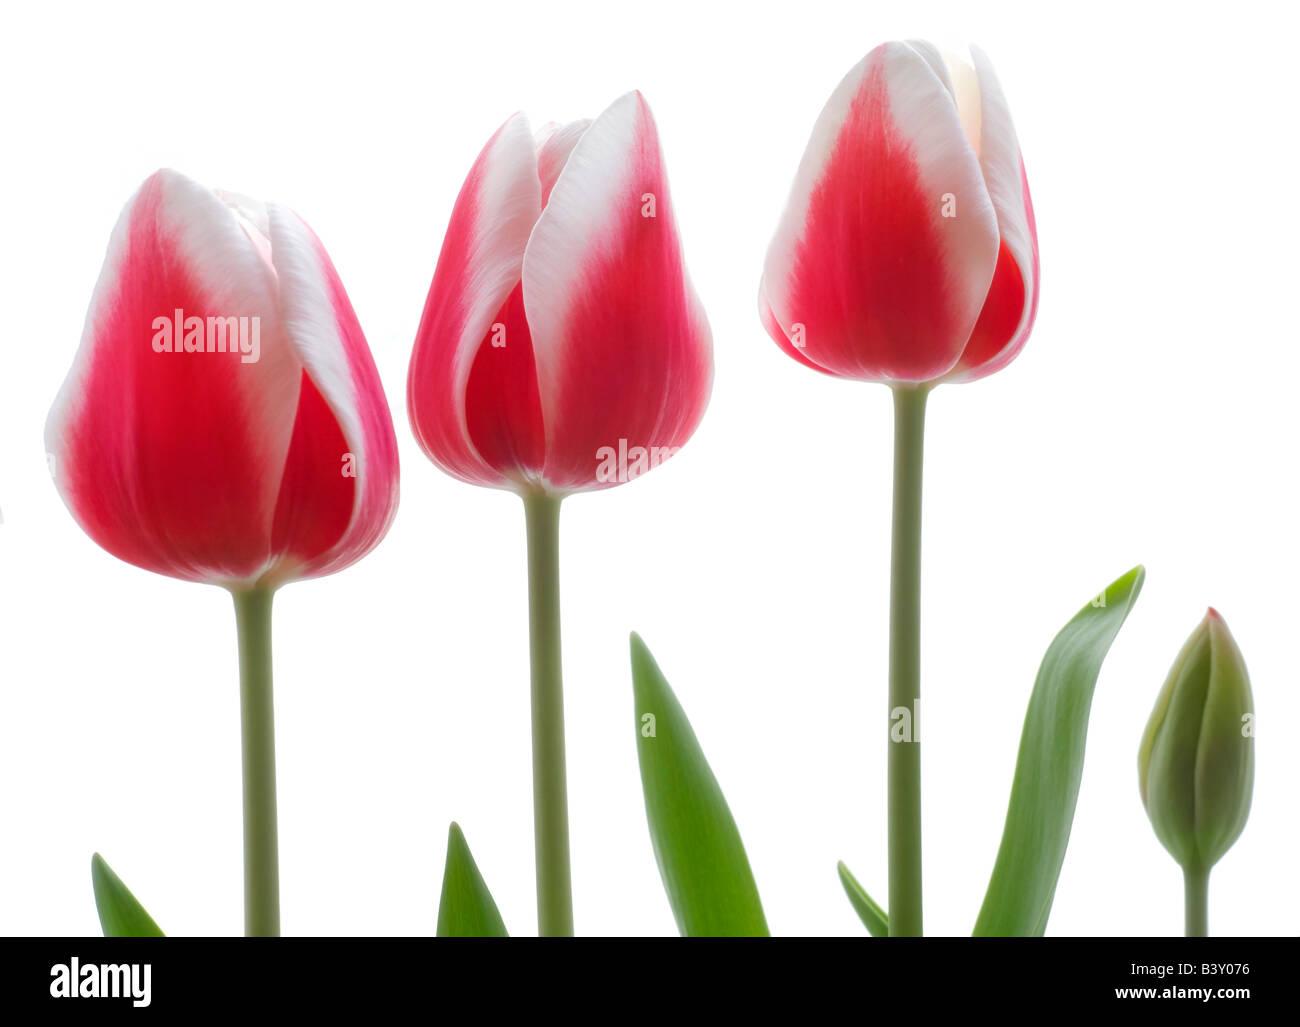 Pink tulips on white background Stock Photo